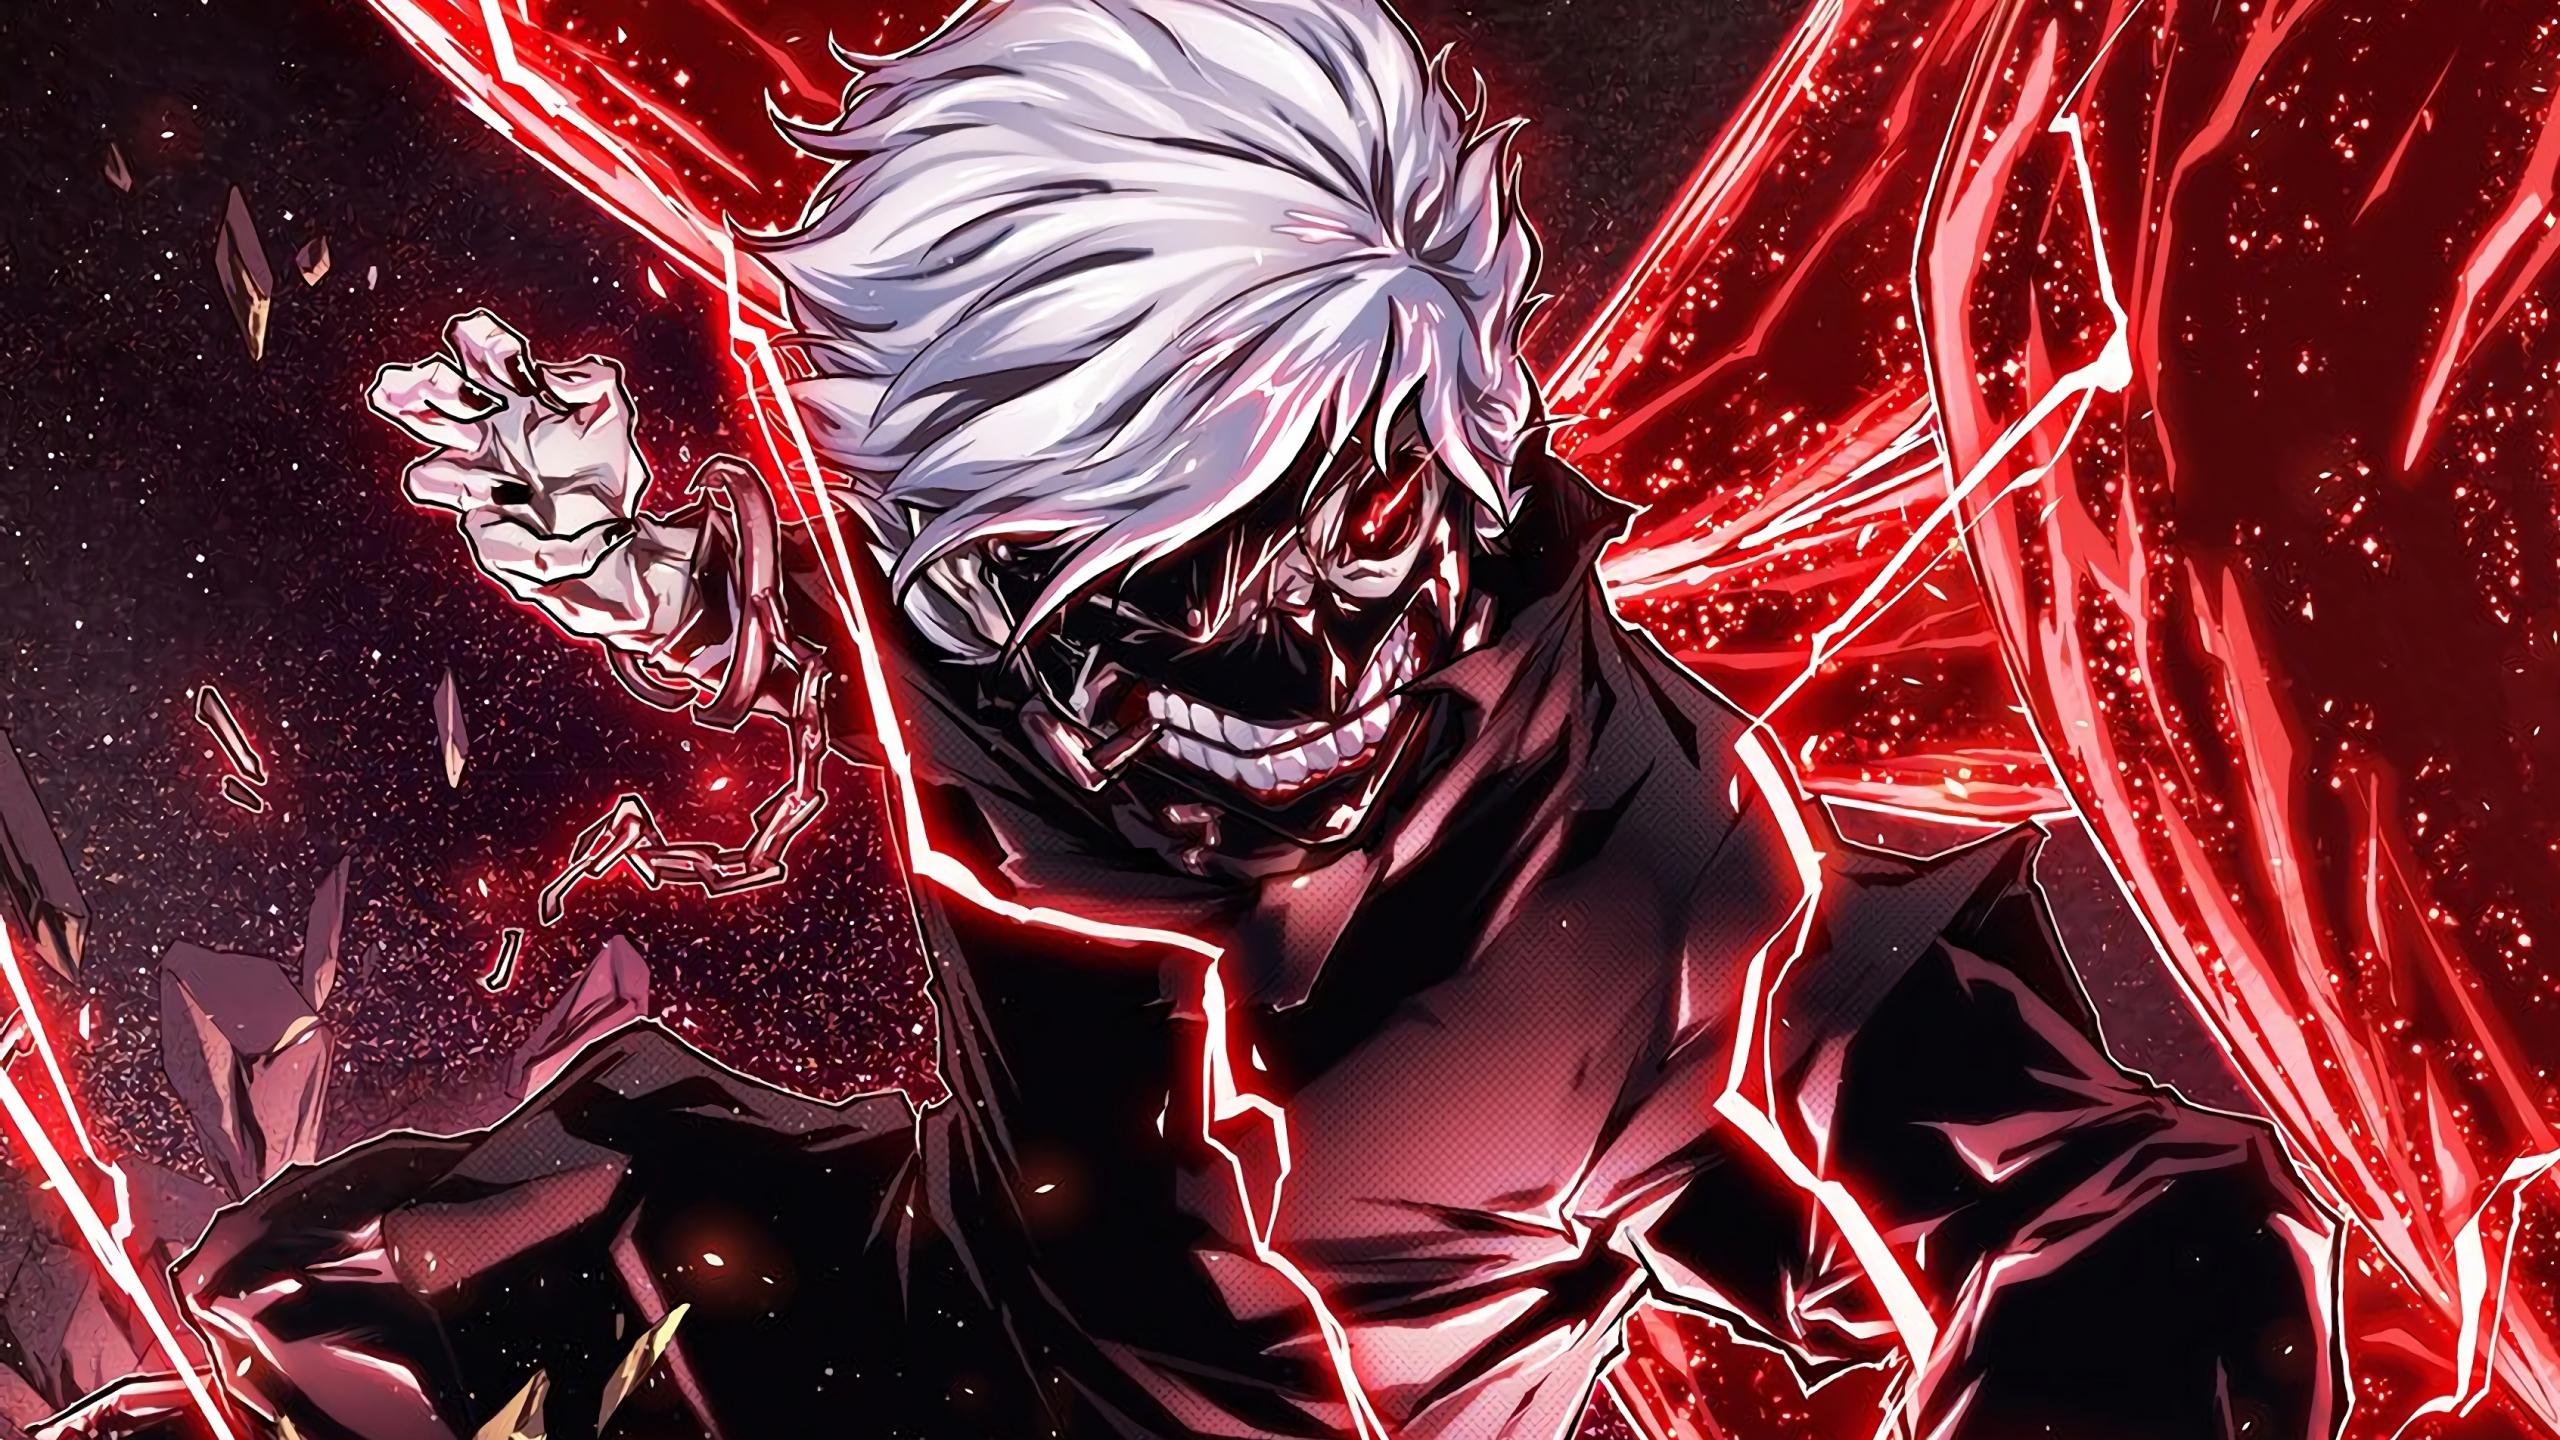 Download 2560x1440 Wallpaper Ken Kaneki Angry Anime Boy